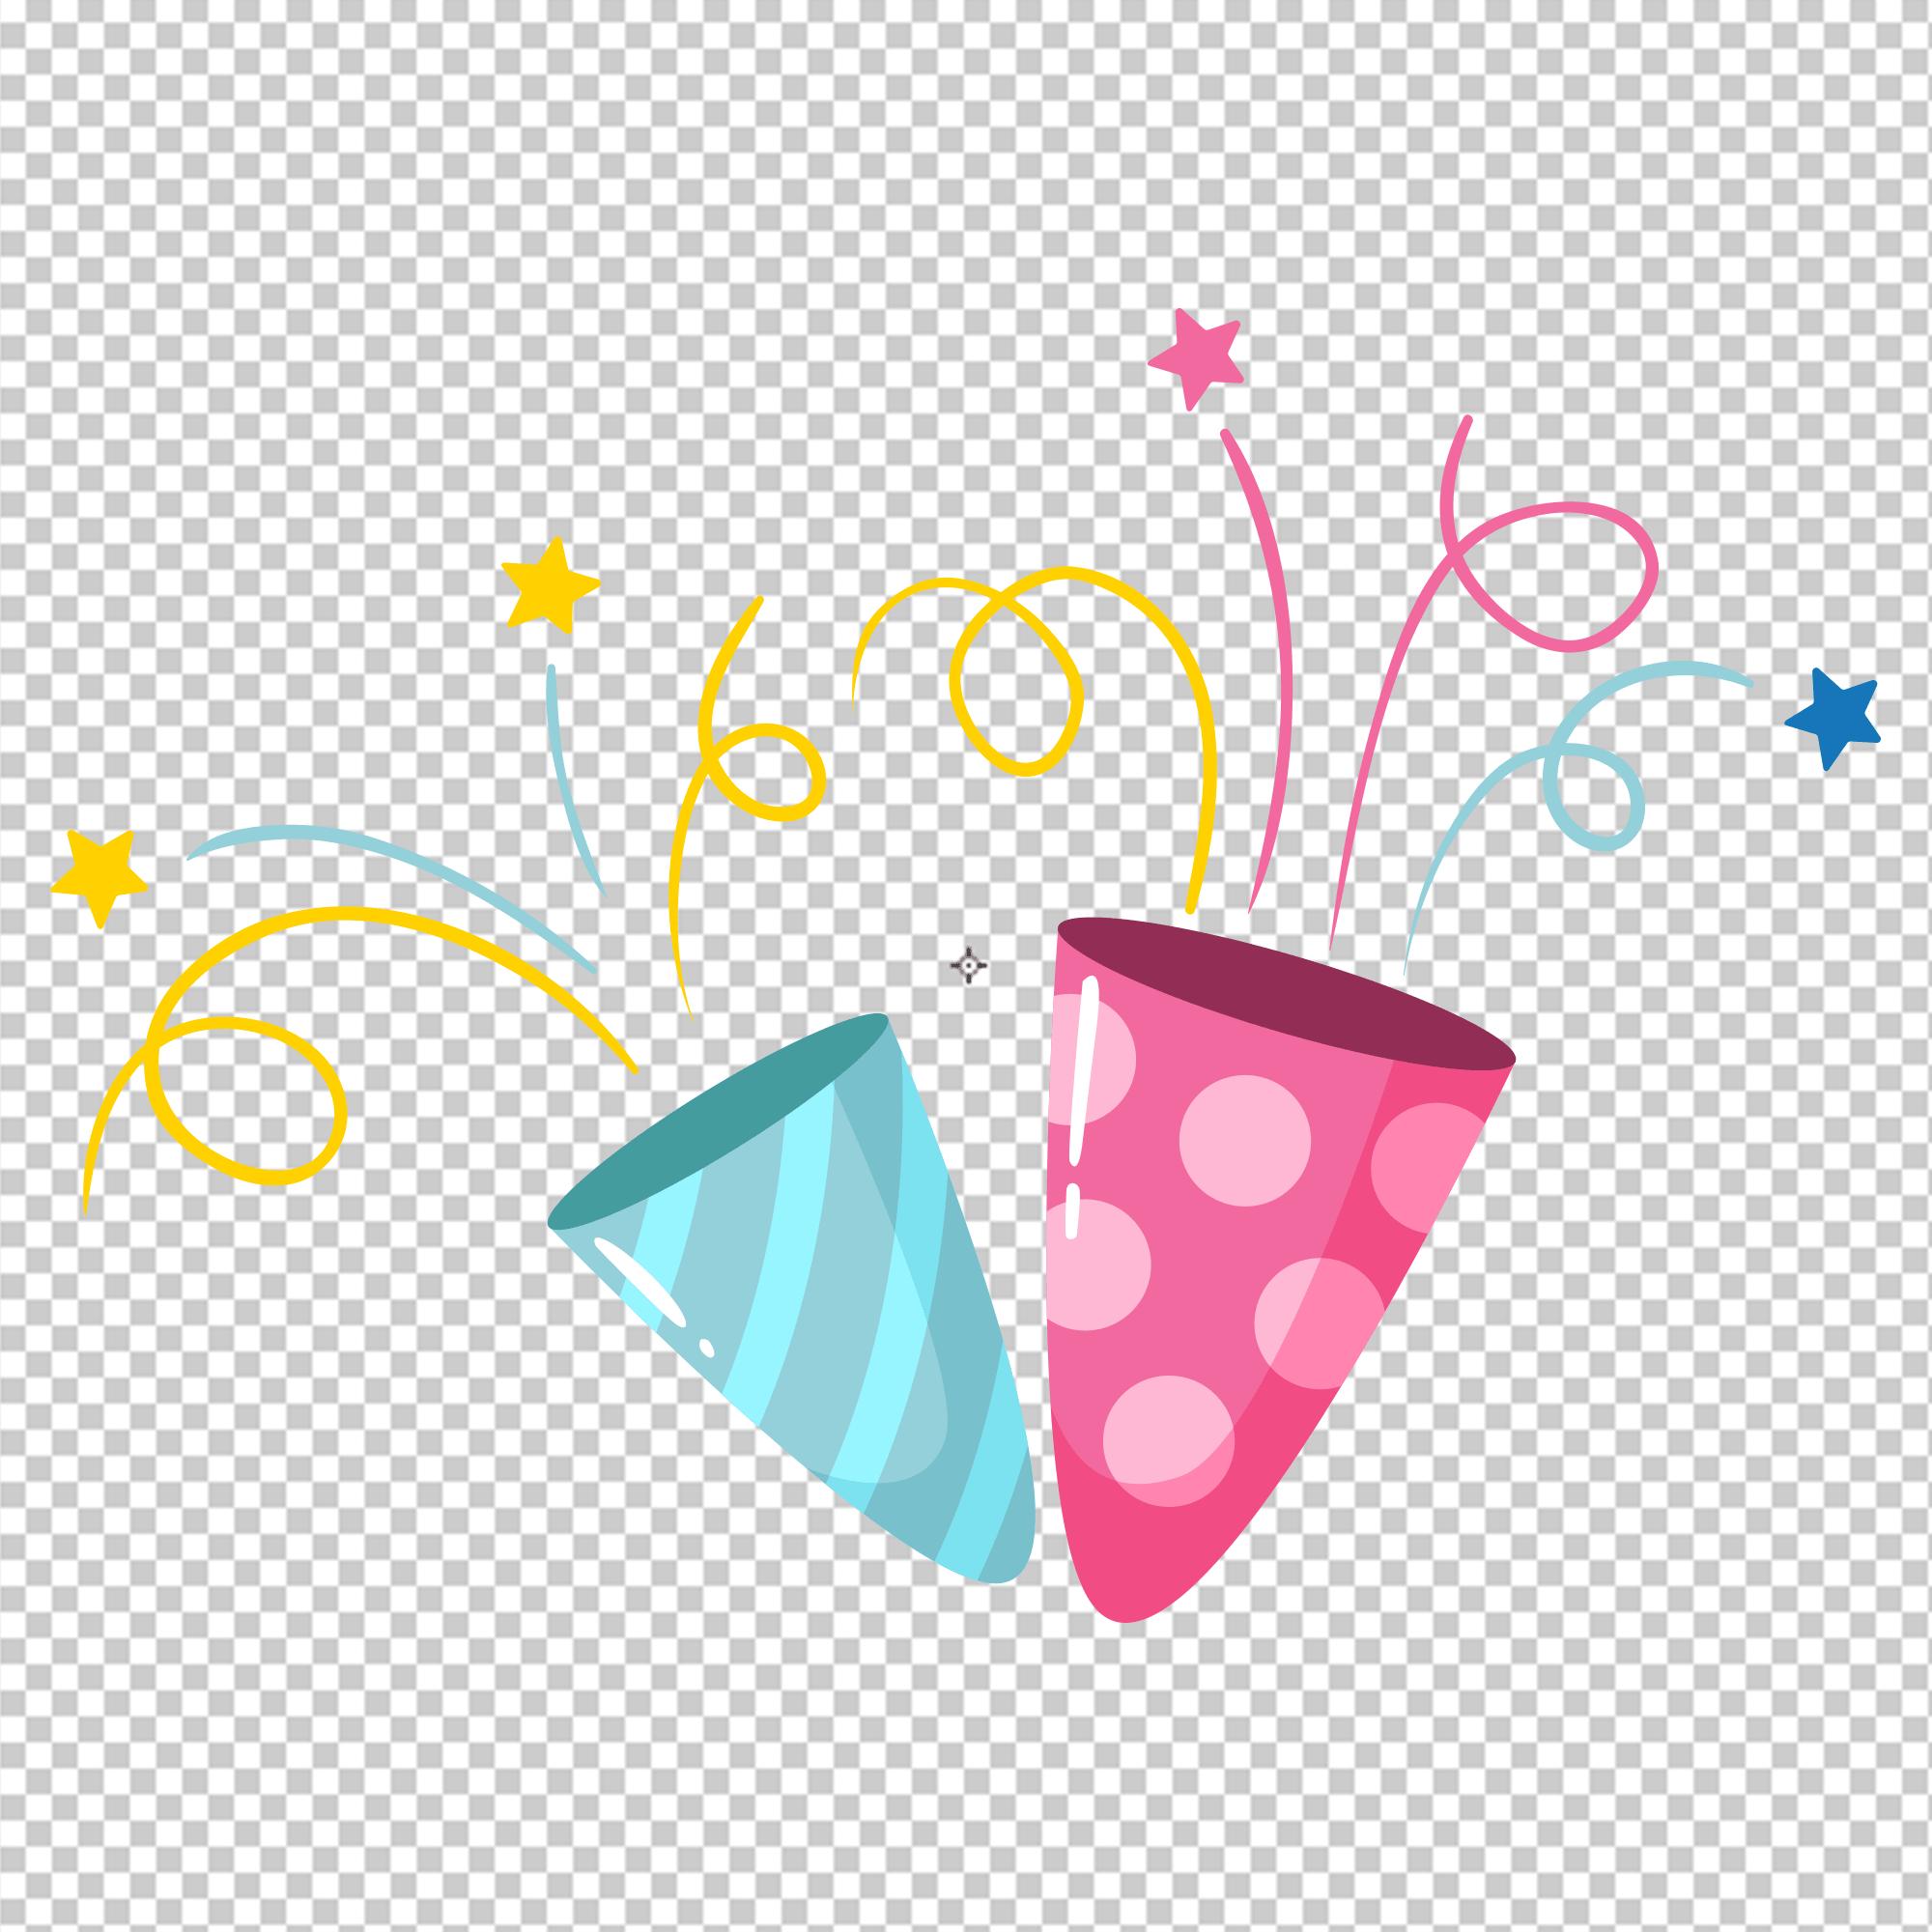 Celebration Png Celebration Crackers Transparent Background Png Clip Art Celebration Party Vector Birthday Background Rectangles Design Balloons